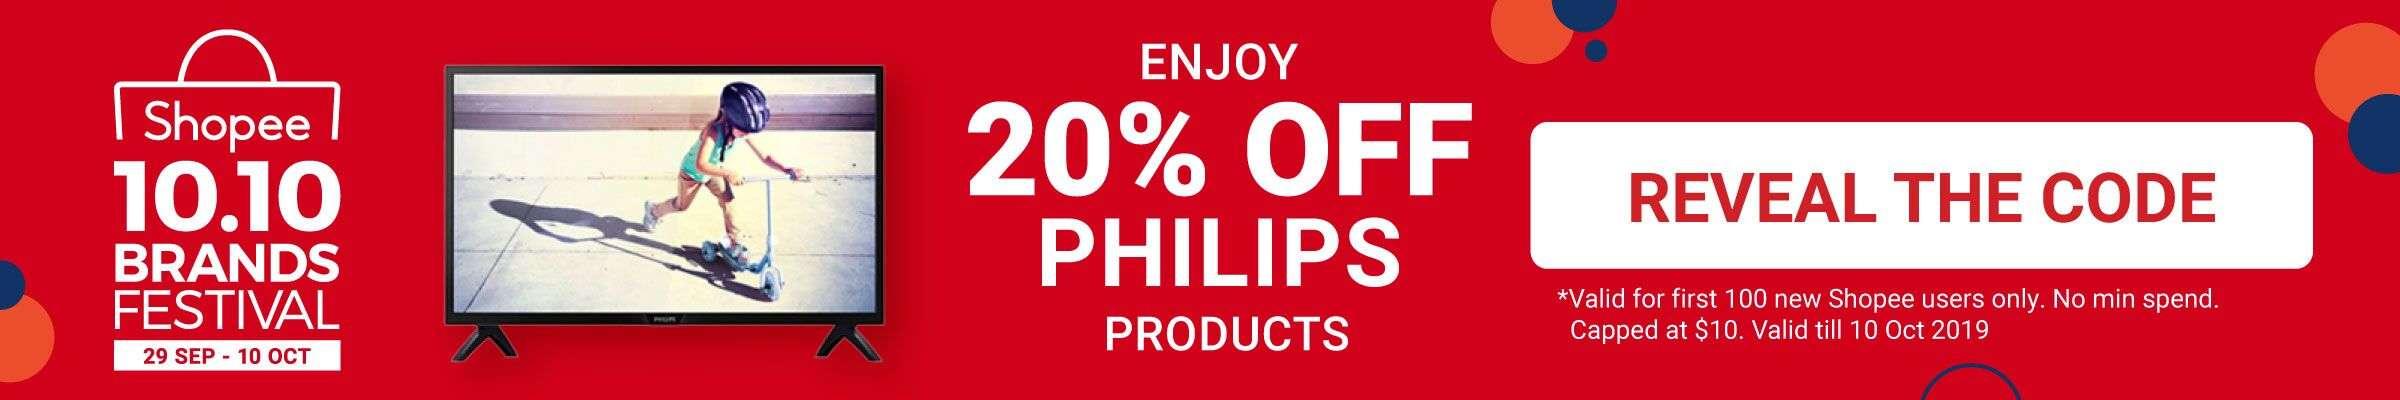 Shopee Philips